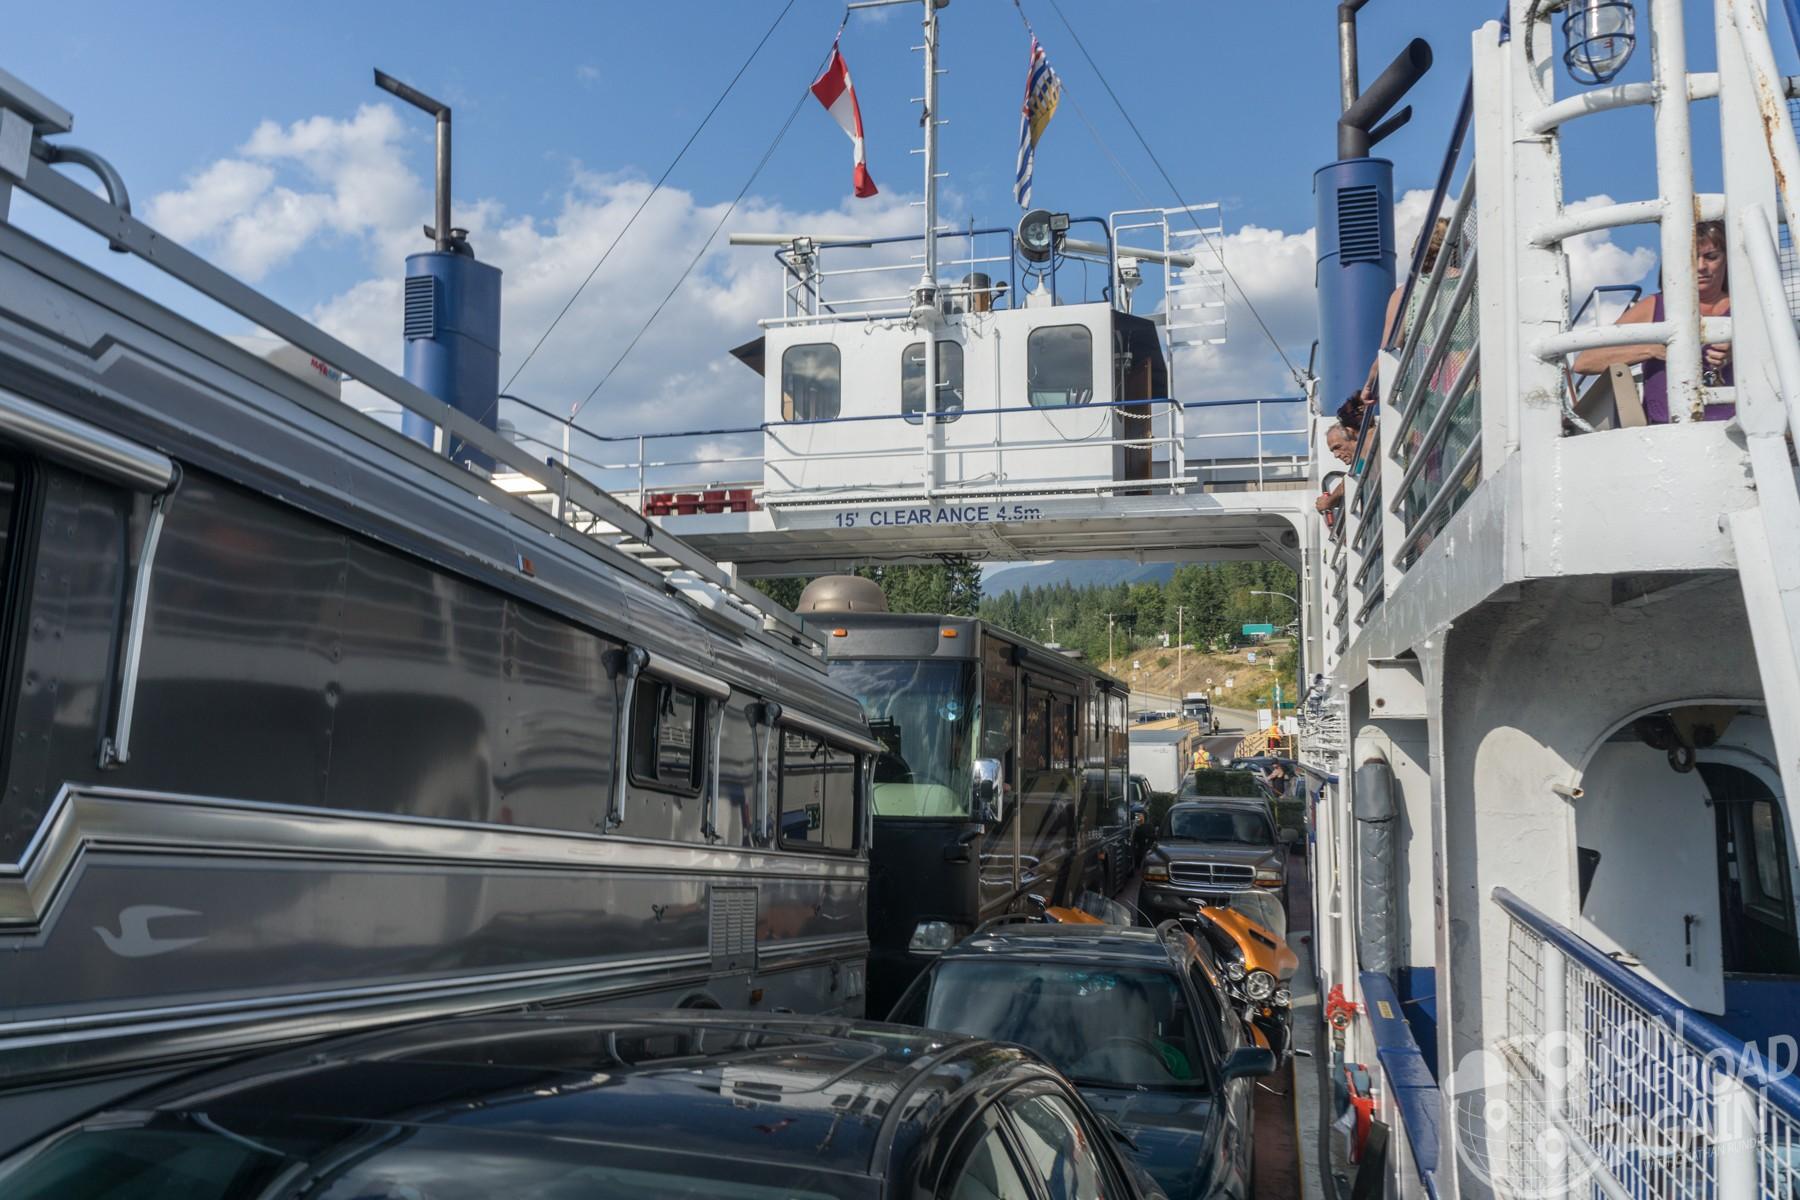 Kootenay Bay / Kootenay Lake Ferry to Balfour